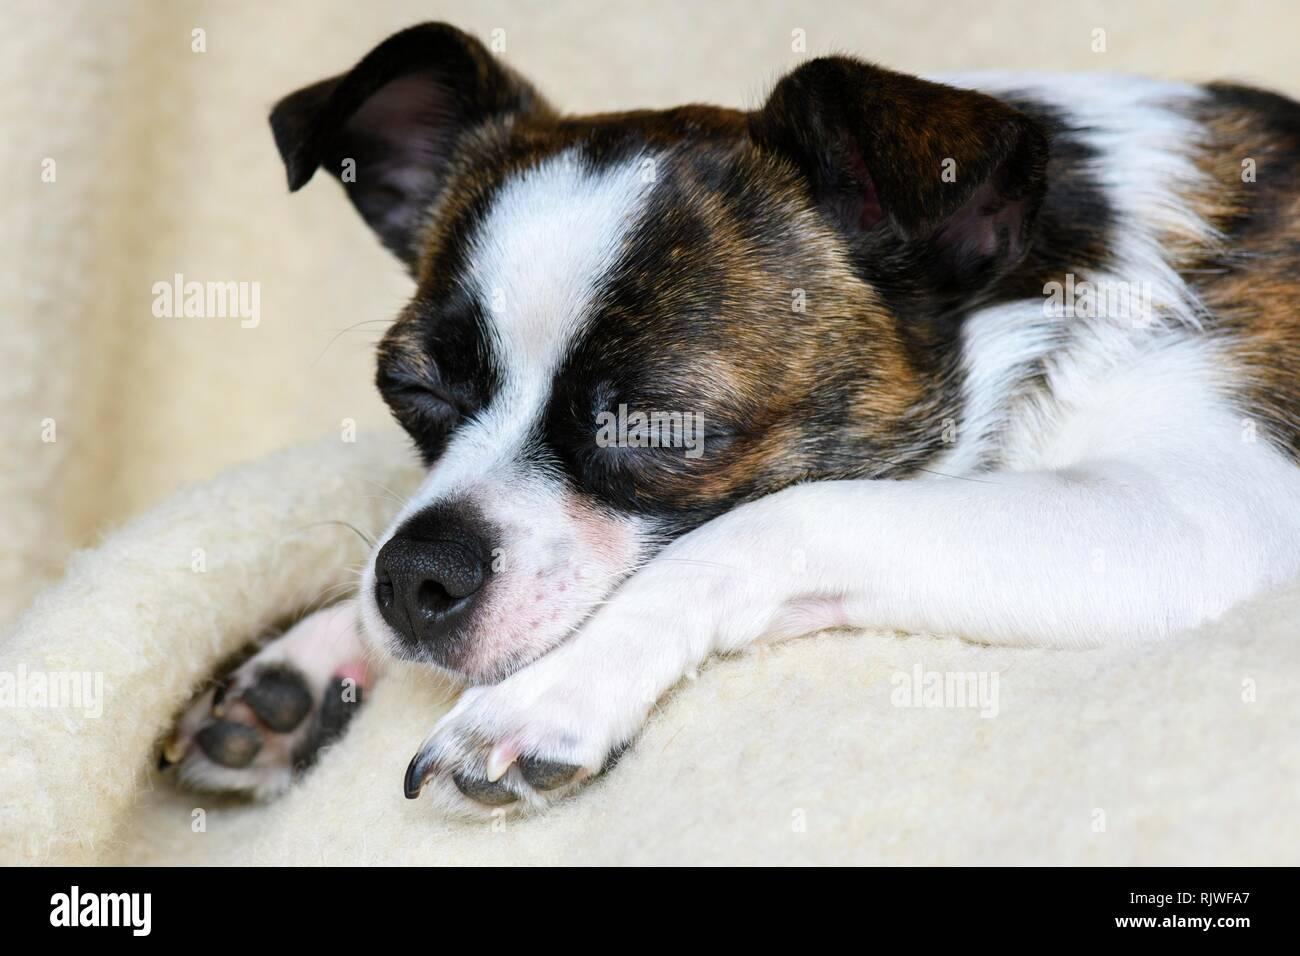 Little Chihuahua Dog, sleeping, animal portrait, Germany - Stock Image